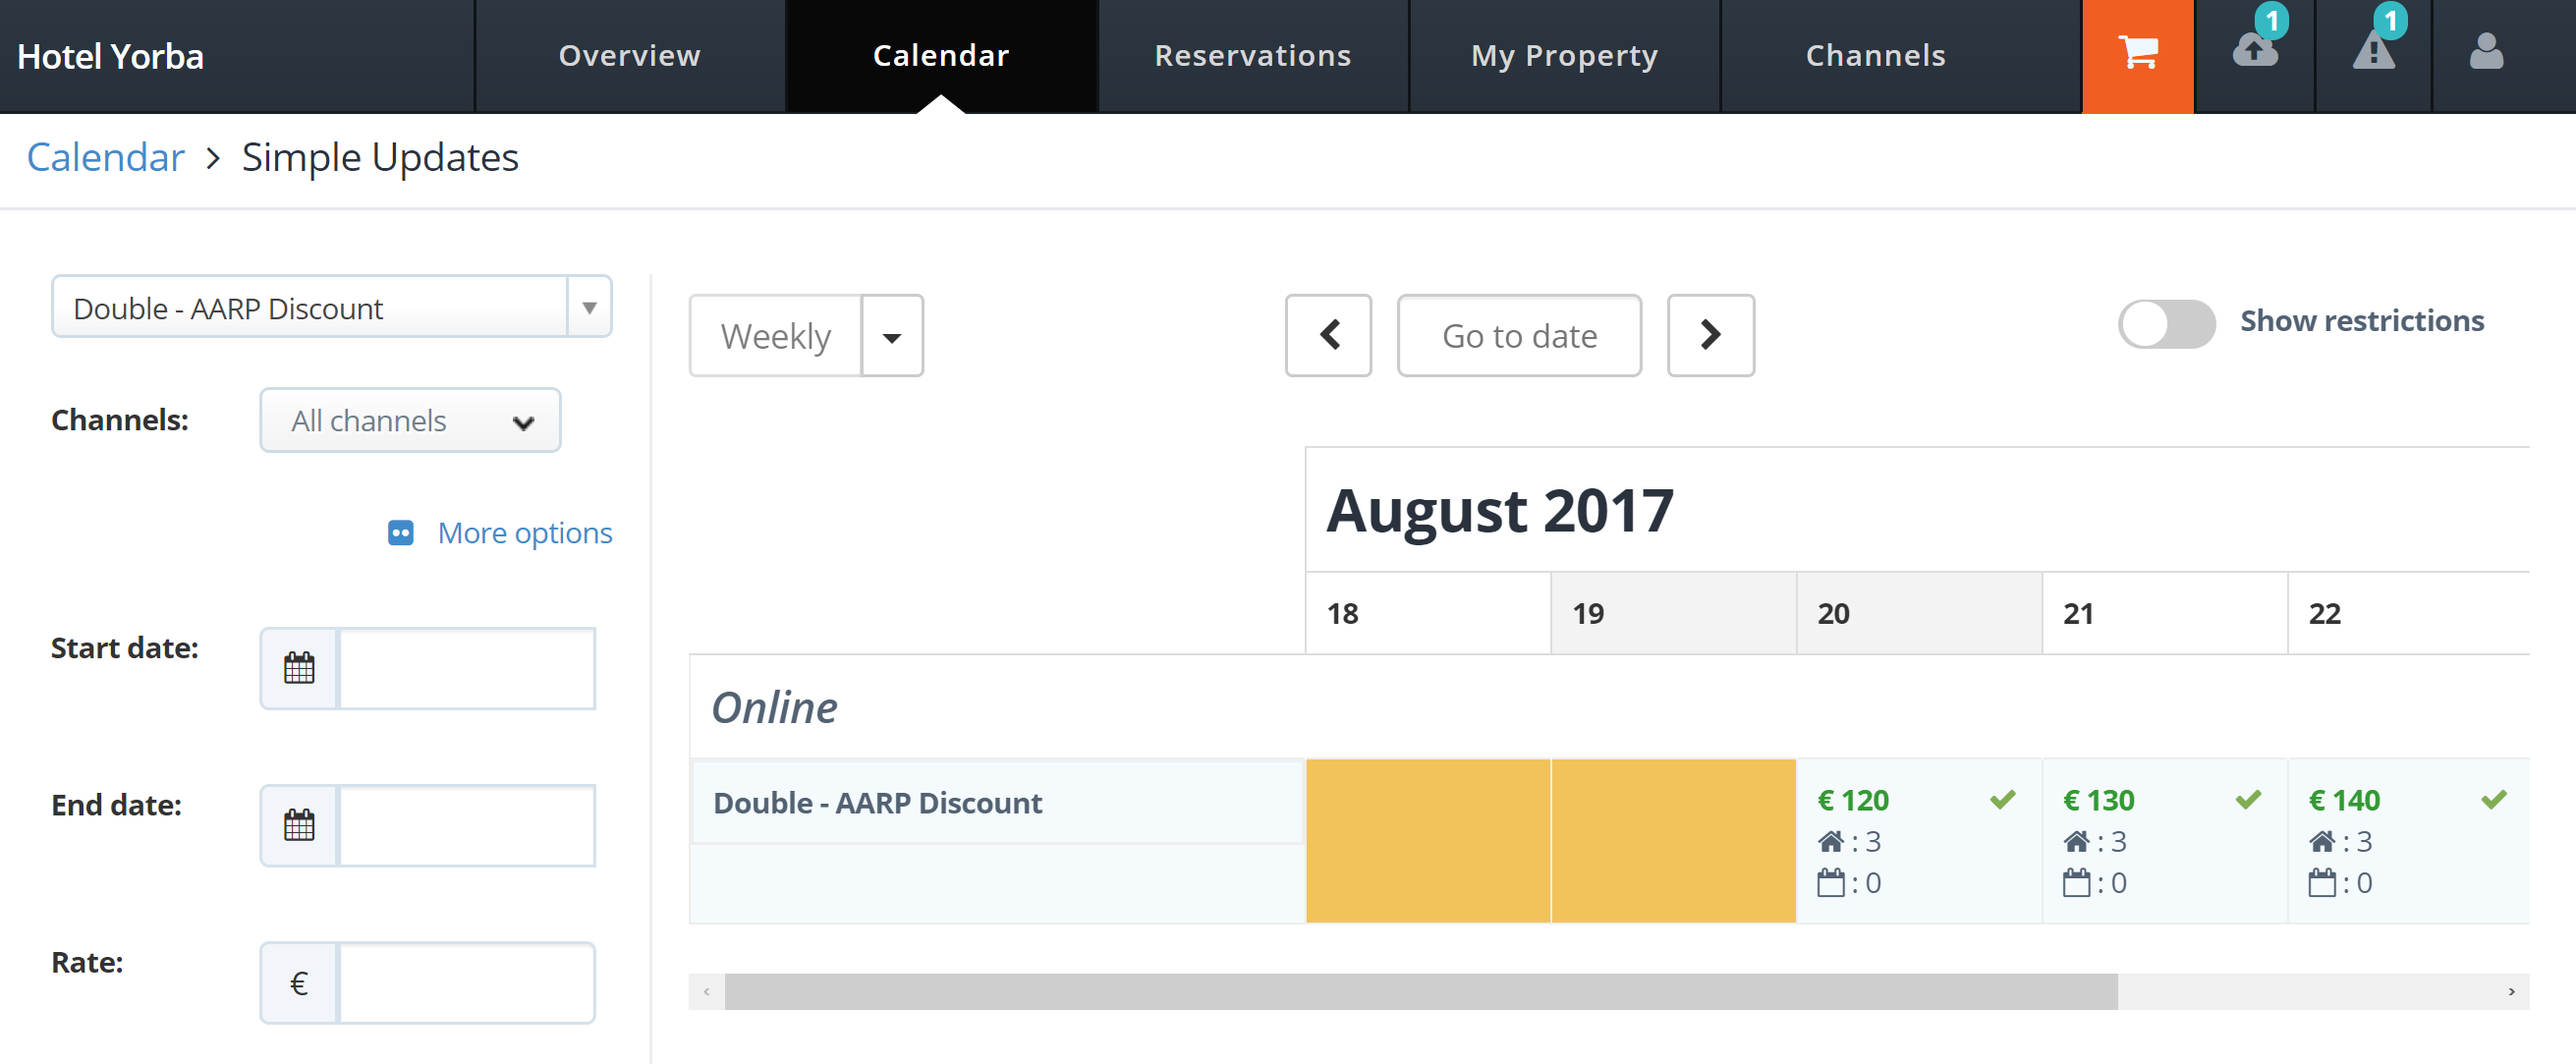 Managing calendar in Hotelrunner.com calendar